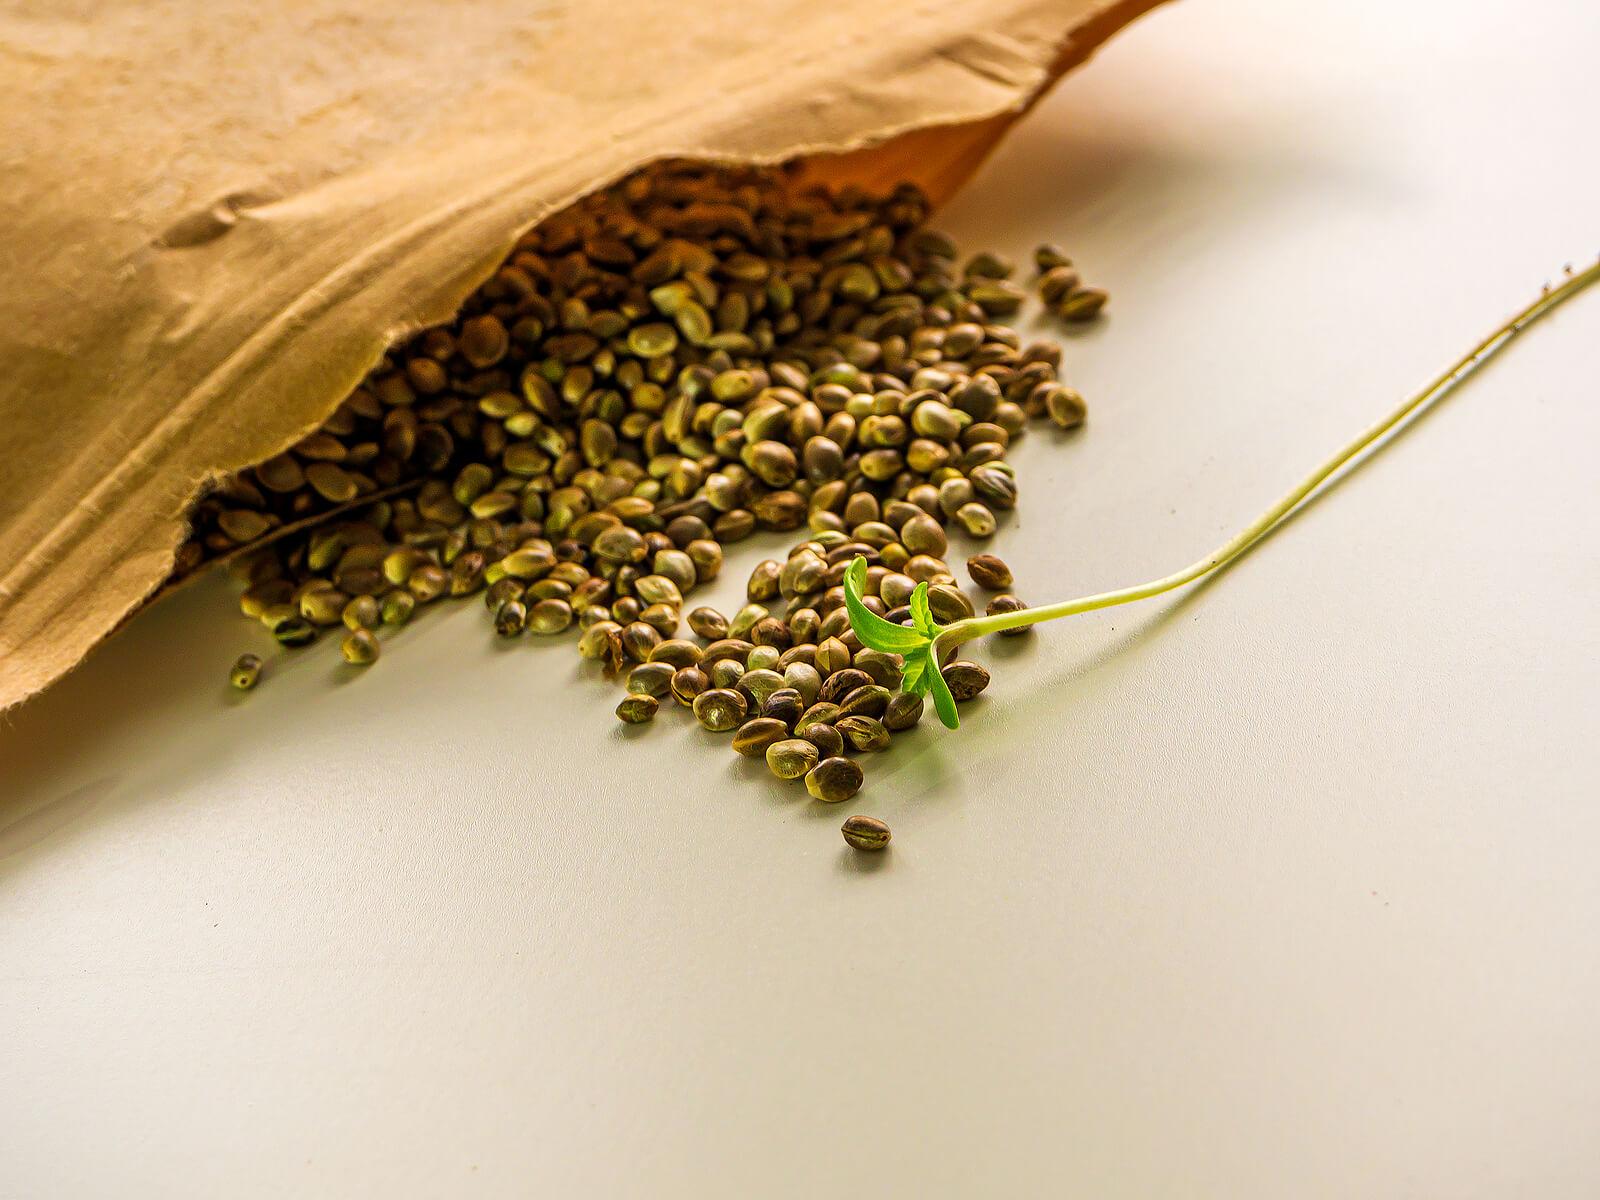 Buy Marijuana Seeds In Crystal Lake